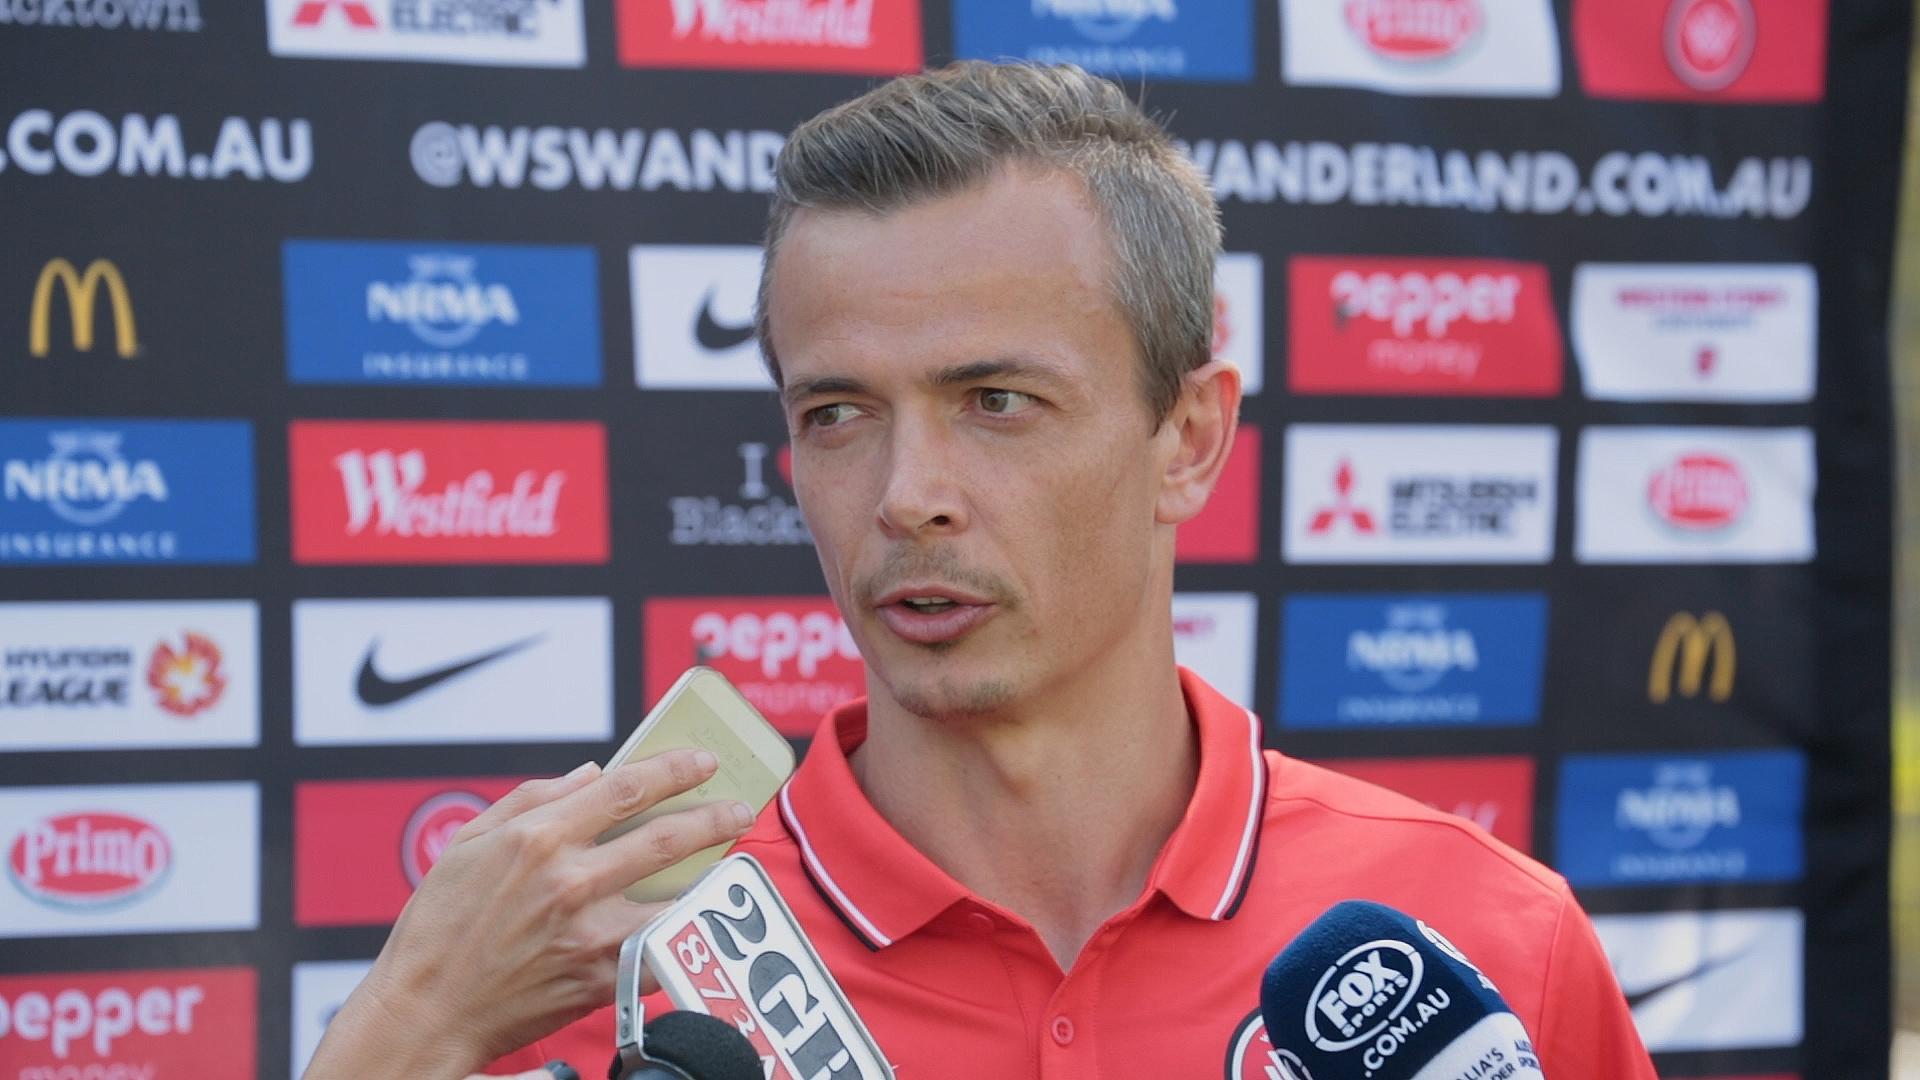 Wanderers striker Ryan Griffiths addresses media ahead of this weekend's Sydney Derby.